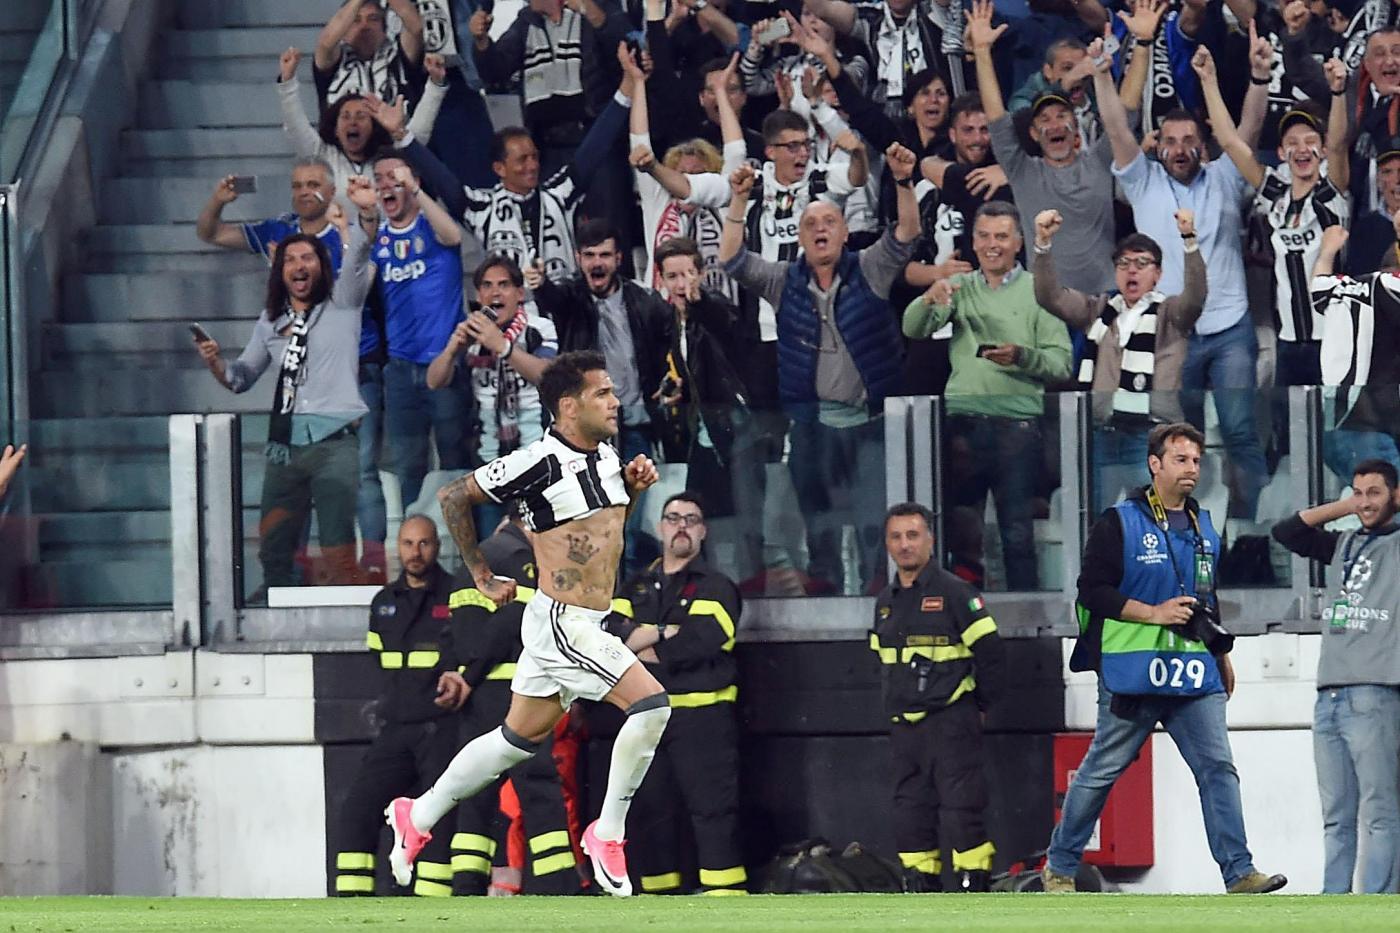 La Juve batte il Monaco 0-2 e vede la finale